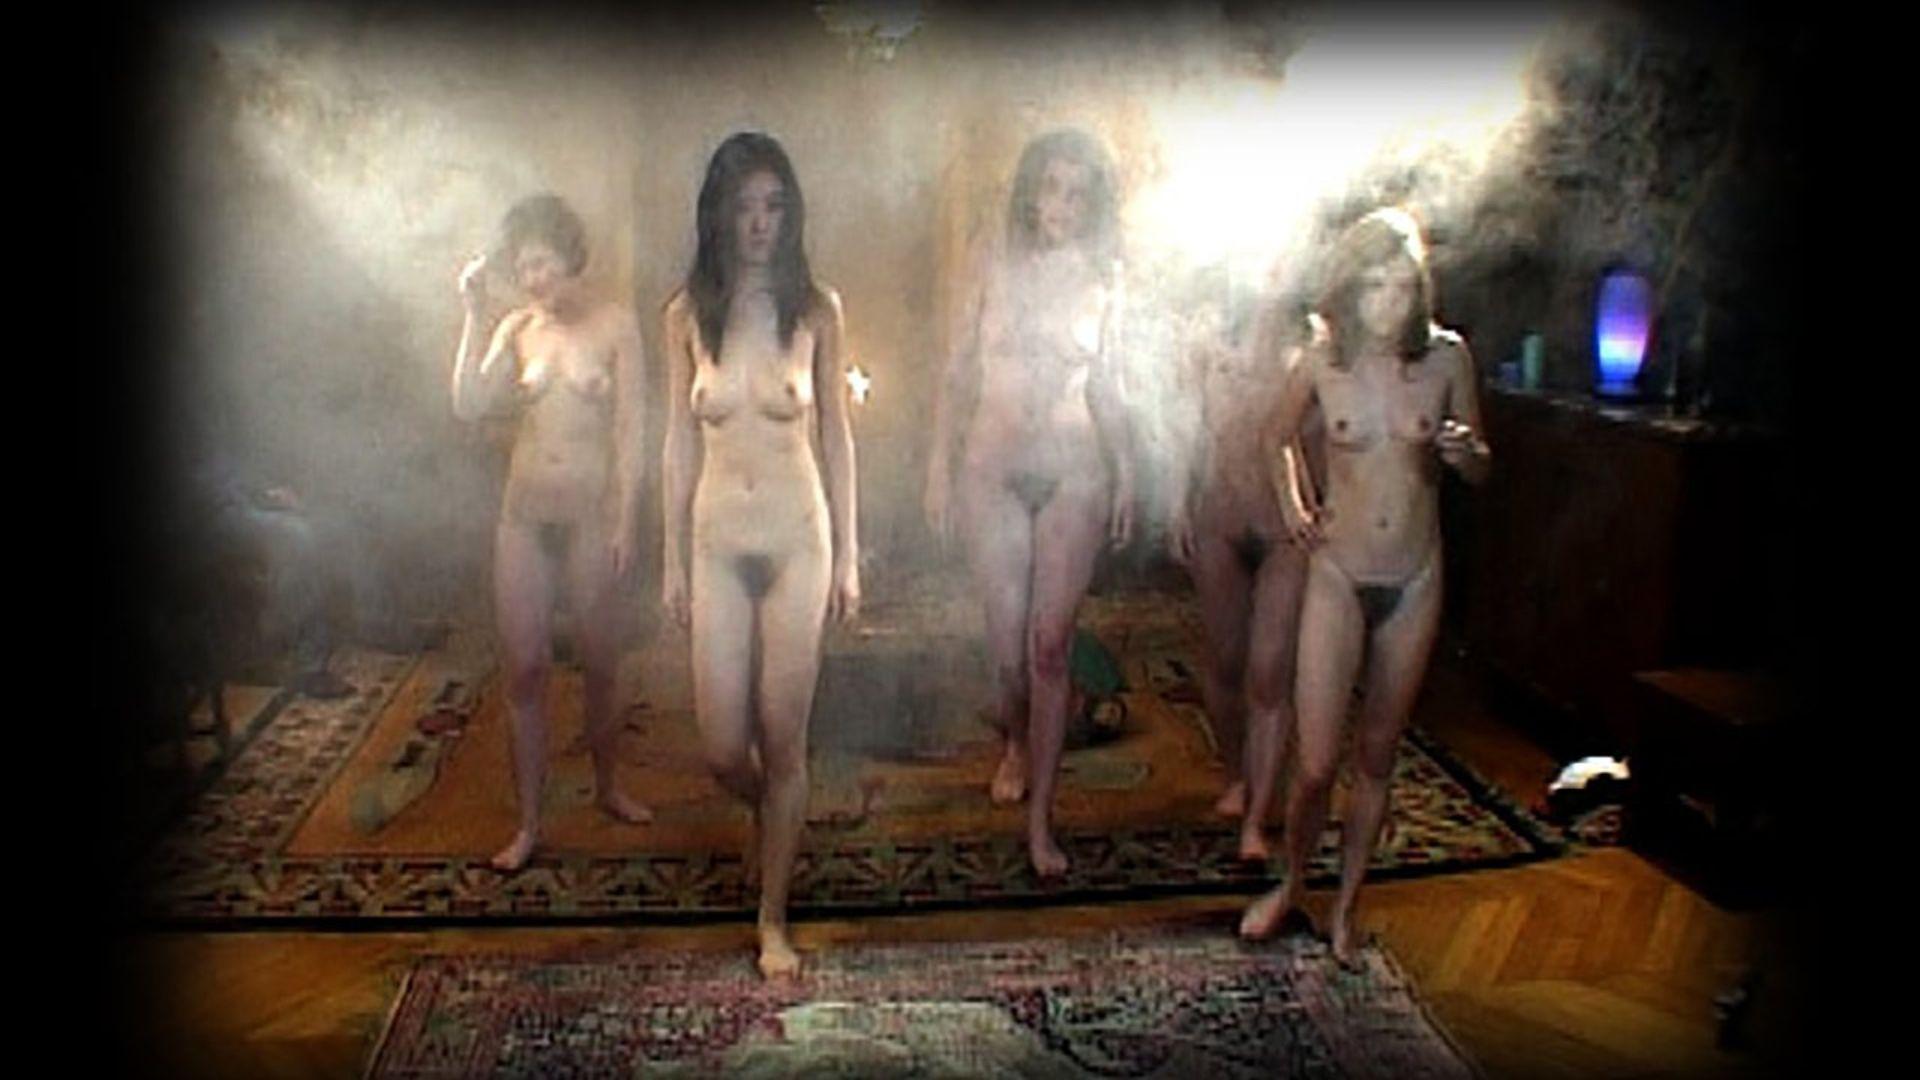 Ania Bielska the lost door (2008) - where to watch it streaming online